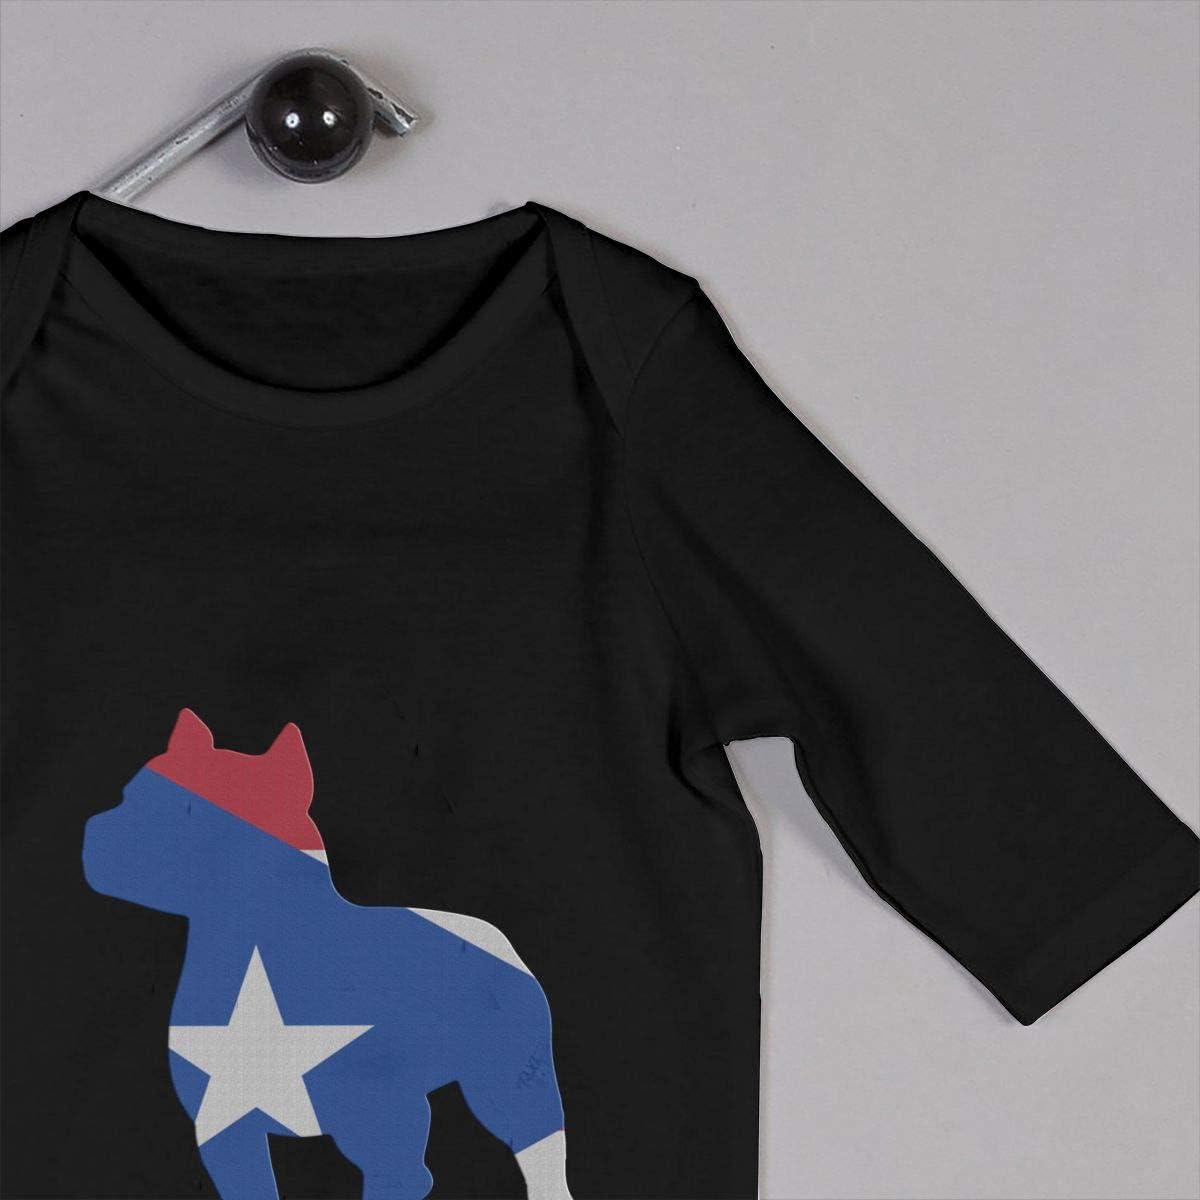 Patriotic Pitbull Puerto Rico Flag Printed Baby Boys Girls One-Piece Suit Long Sleeve Romper Black